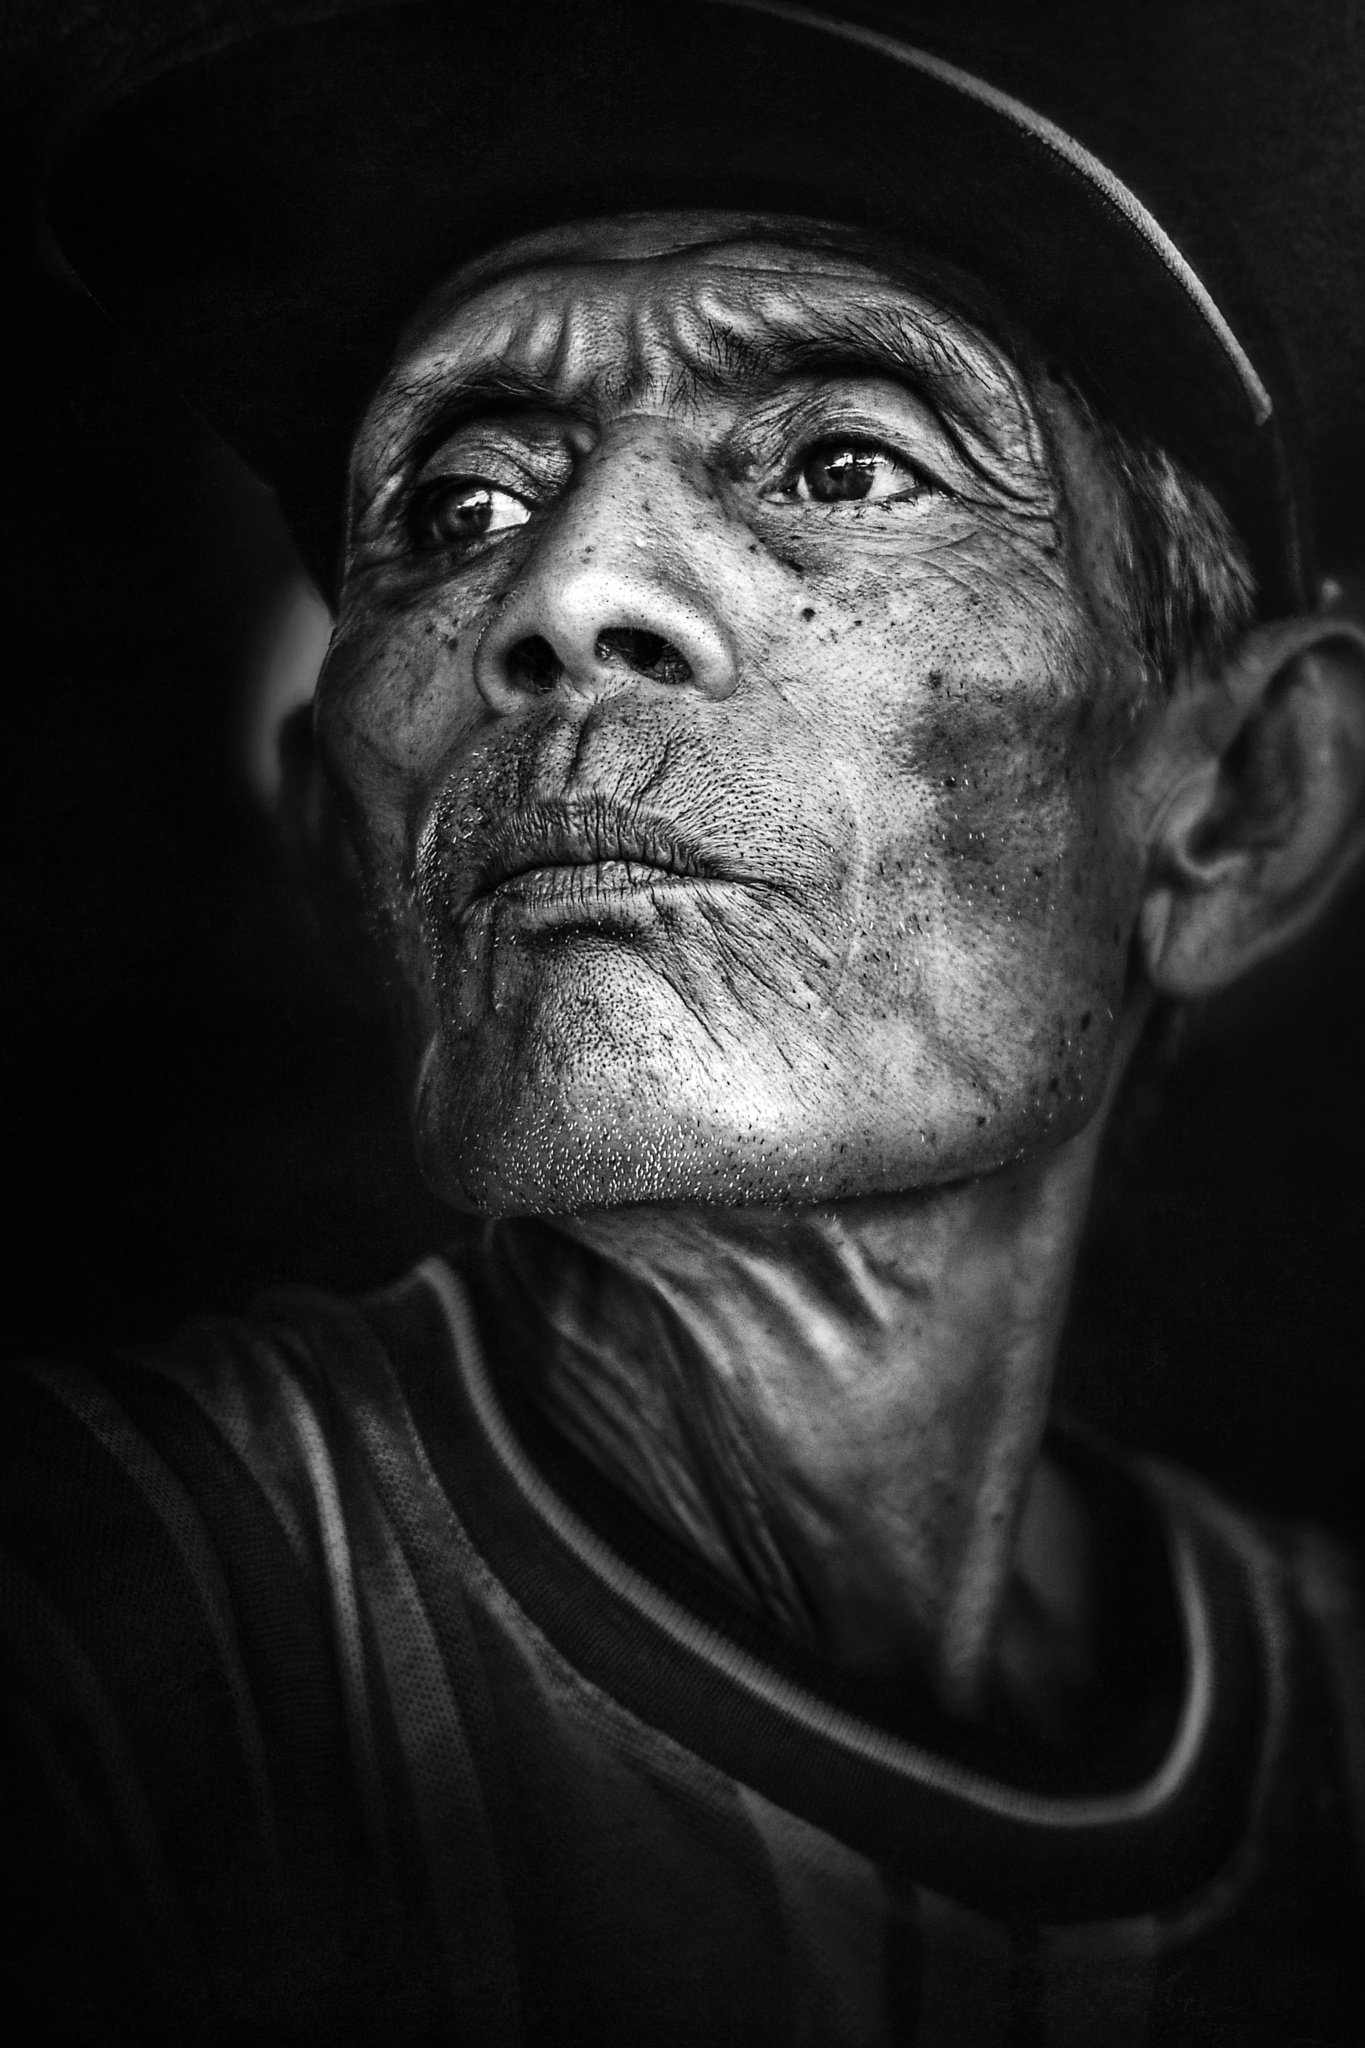 Untitled by rikisetiawan